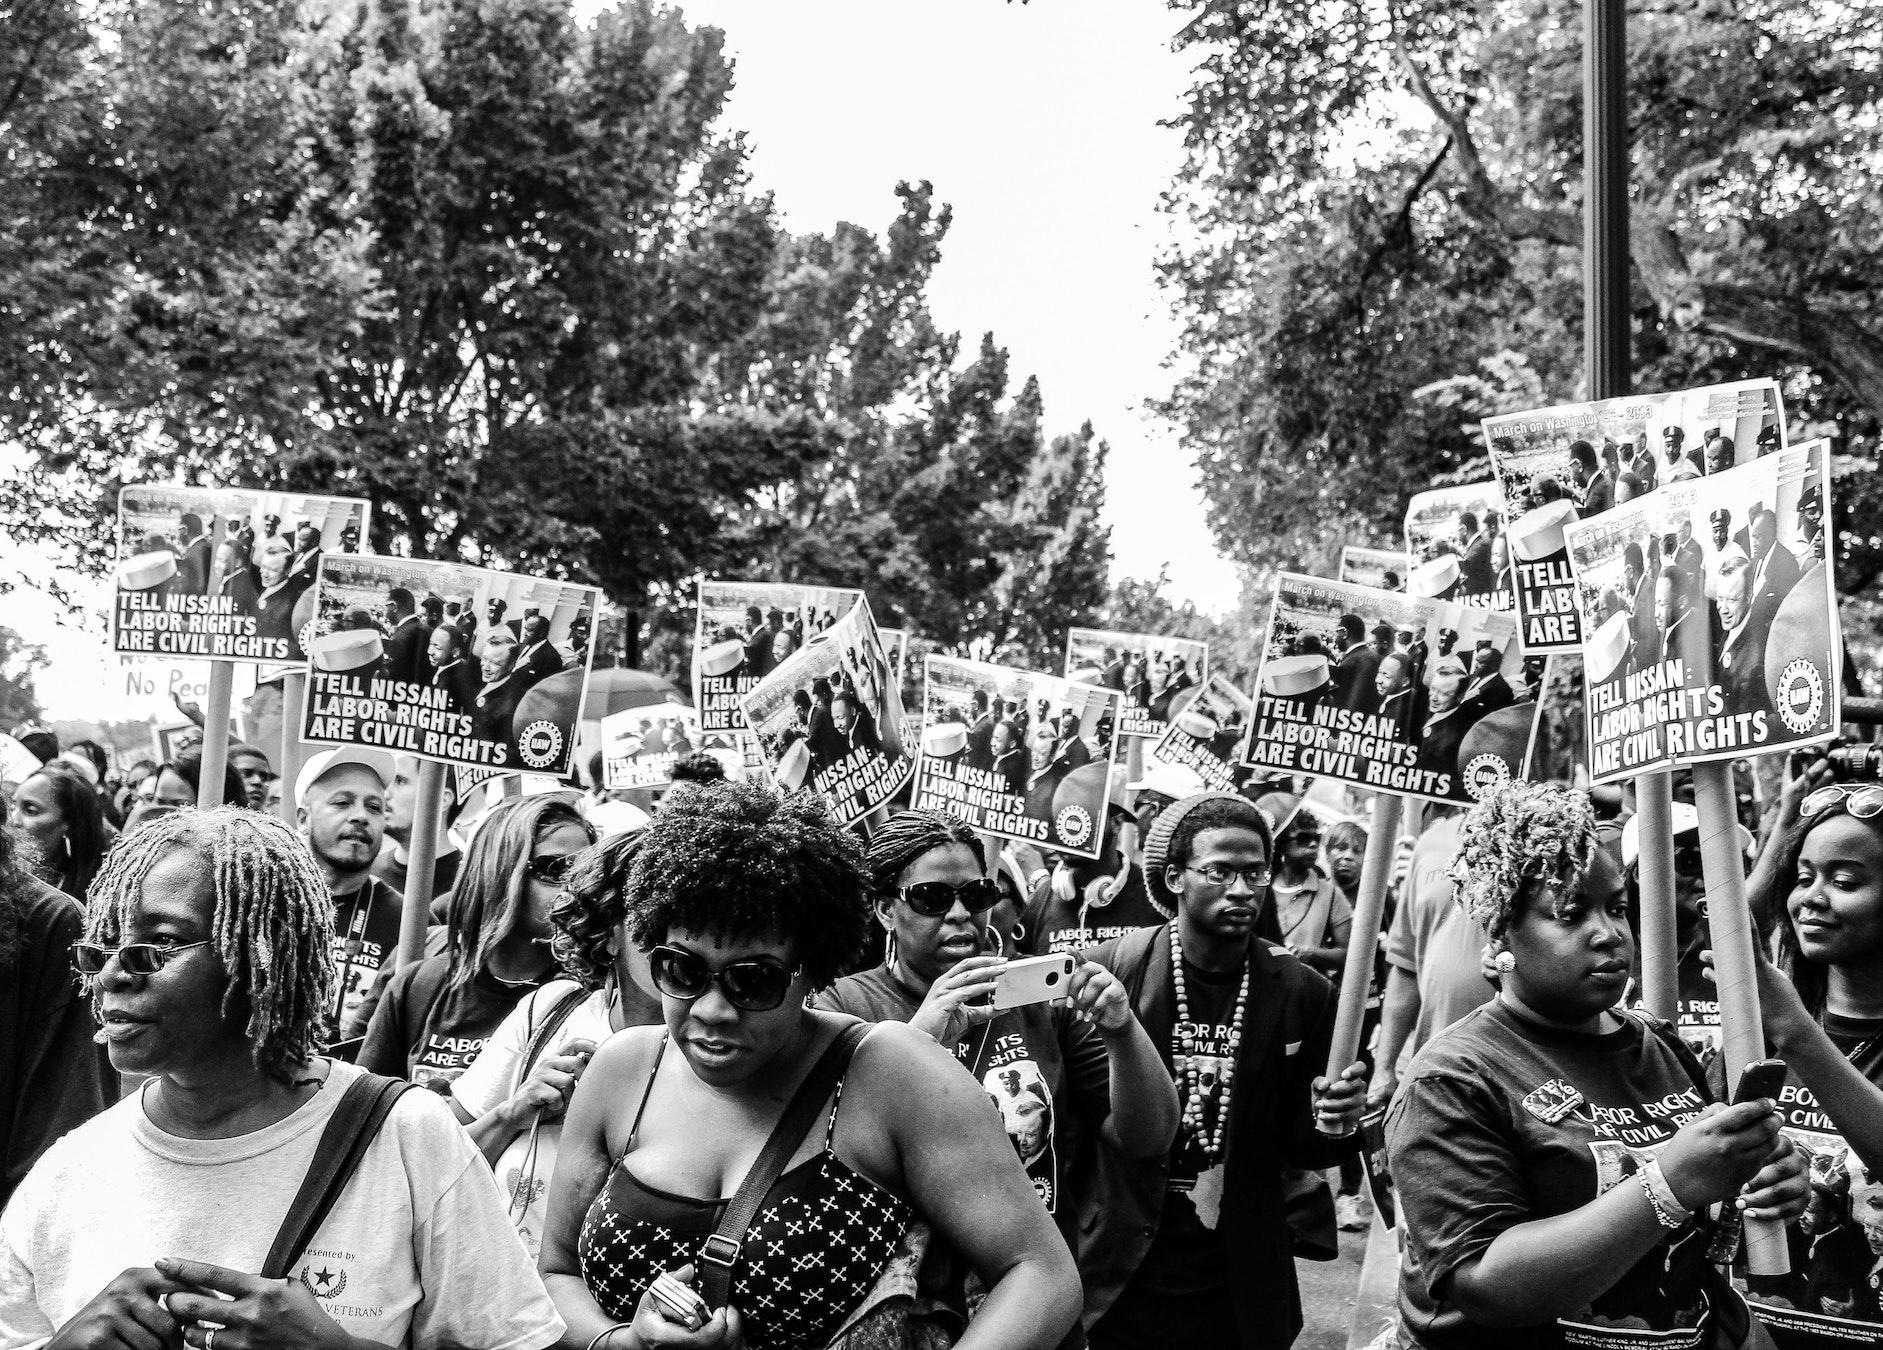 March On Washington (Washington, DC/2013)